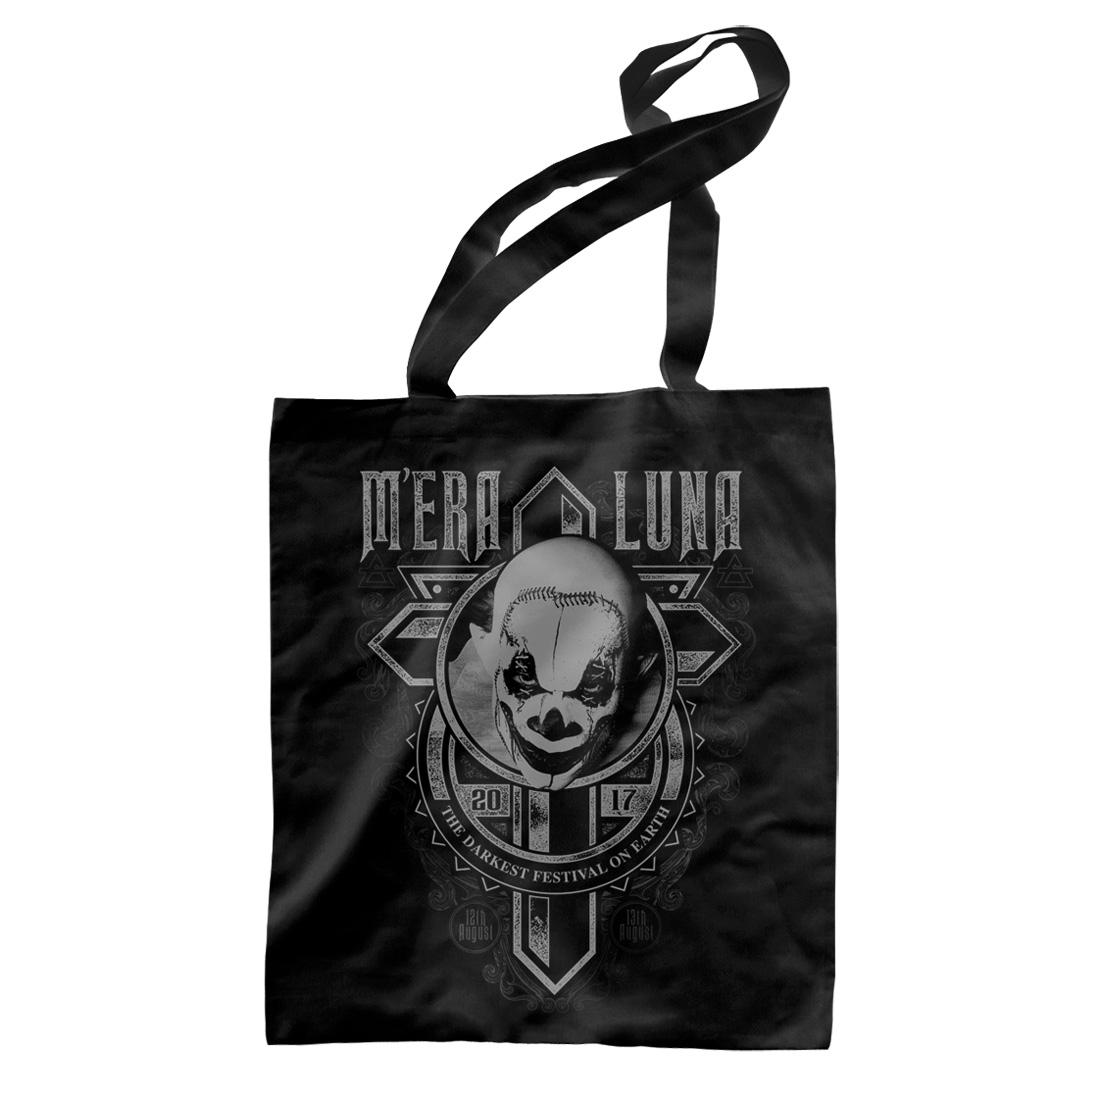 Clown Cross von Mera Luna Festival - Record Bag jetzt im Bravado Shop